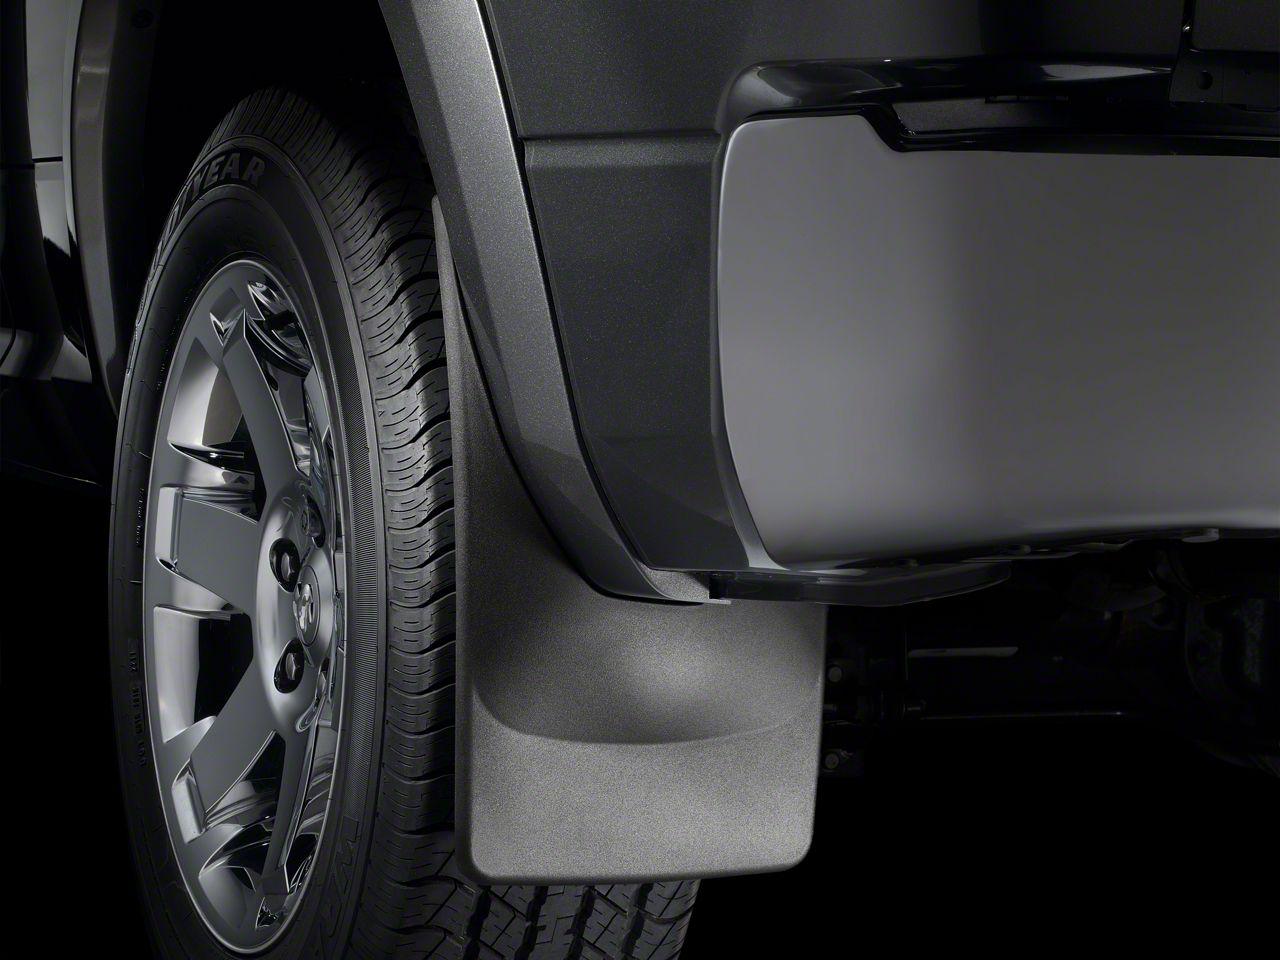 Weathertech Rear No-Drill MudFlaps - Black (2019 RAM 1500 w/ OE Flares)